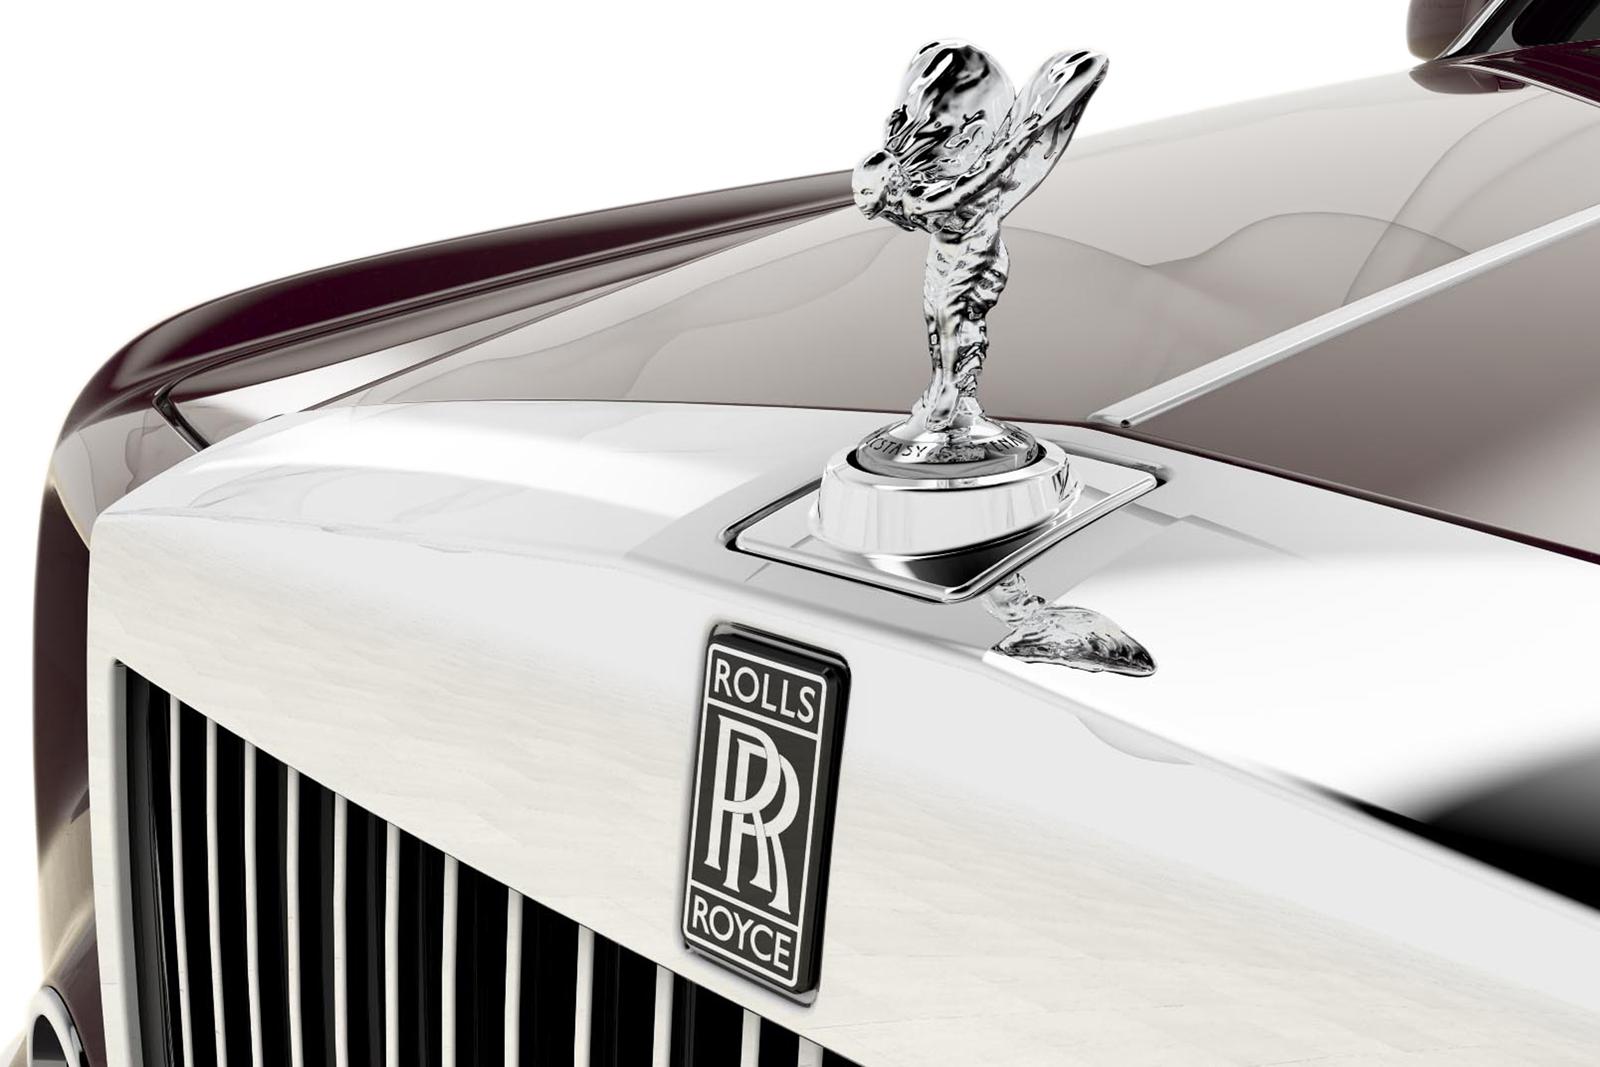 Rolls Royce front end